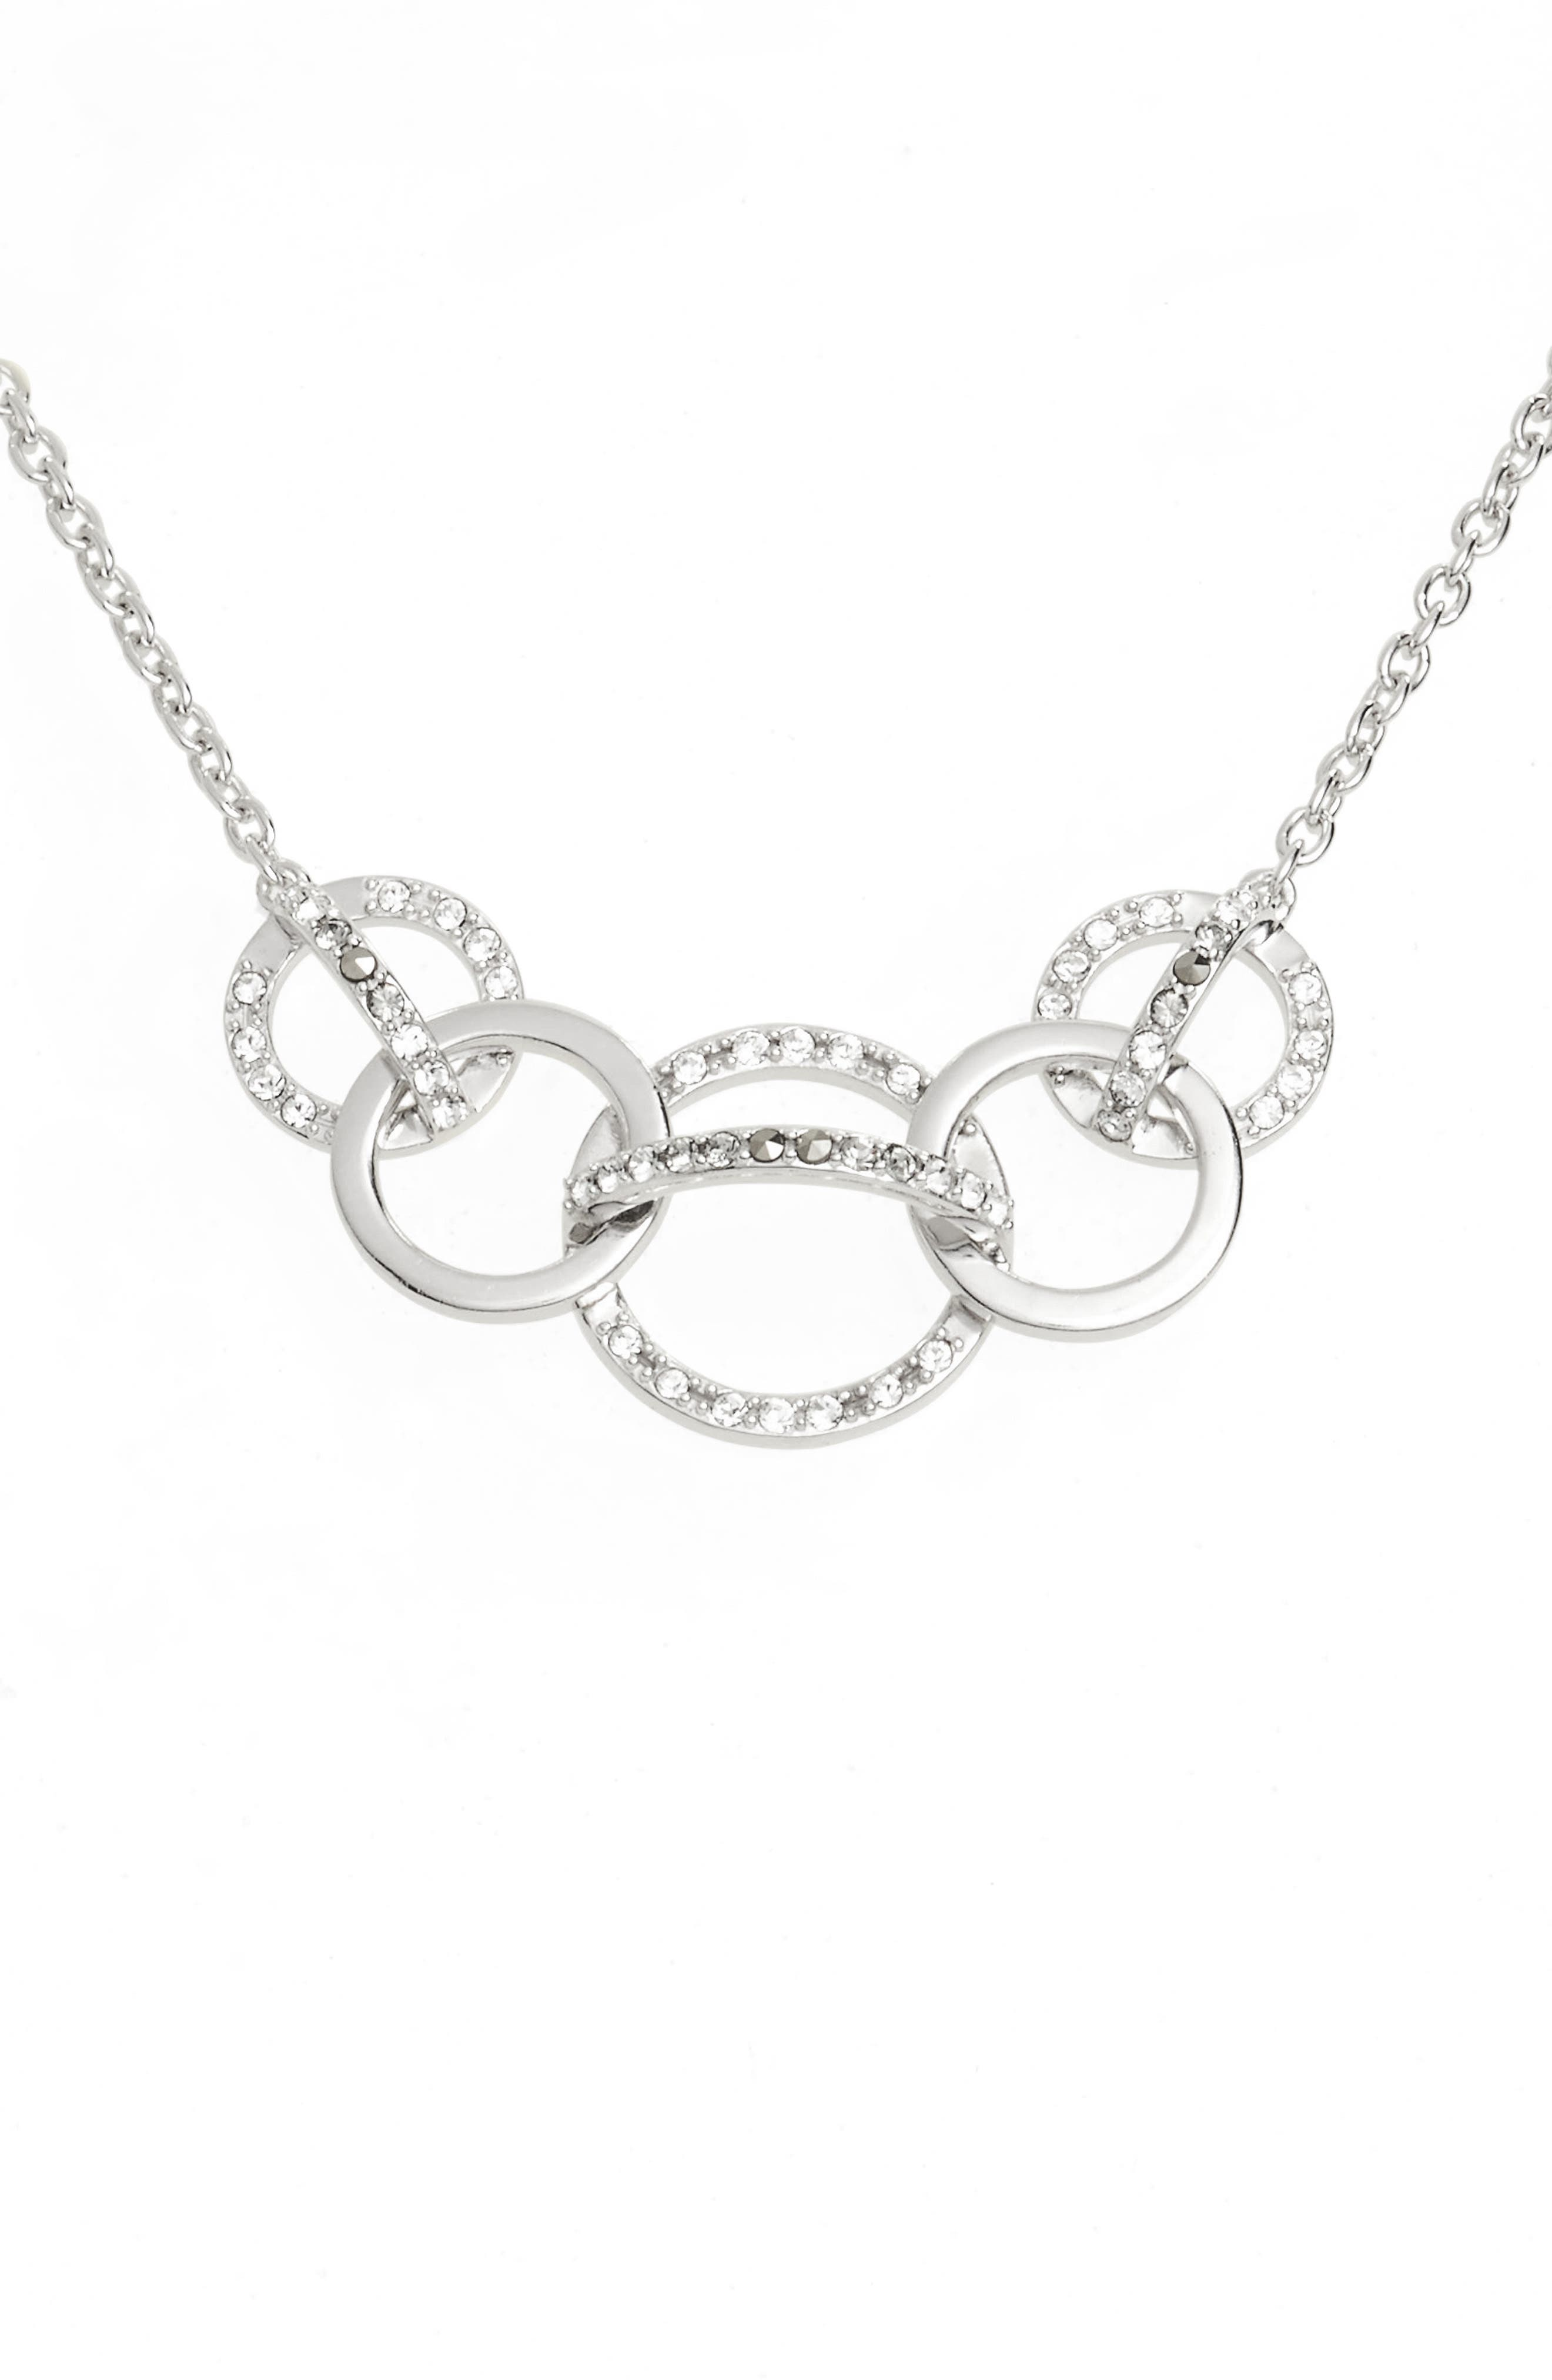 Main Image - Judith Jack Silver Sparkle Crystal Collar Necklace